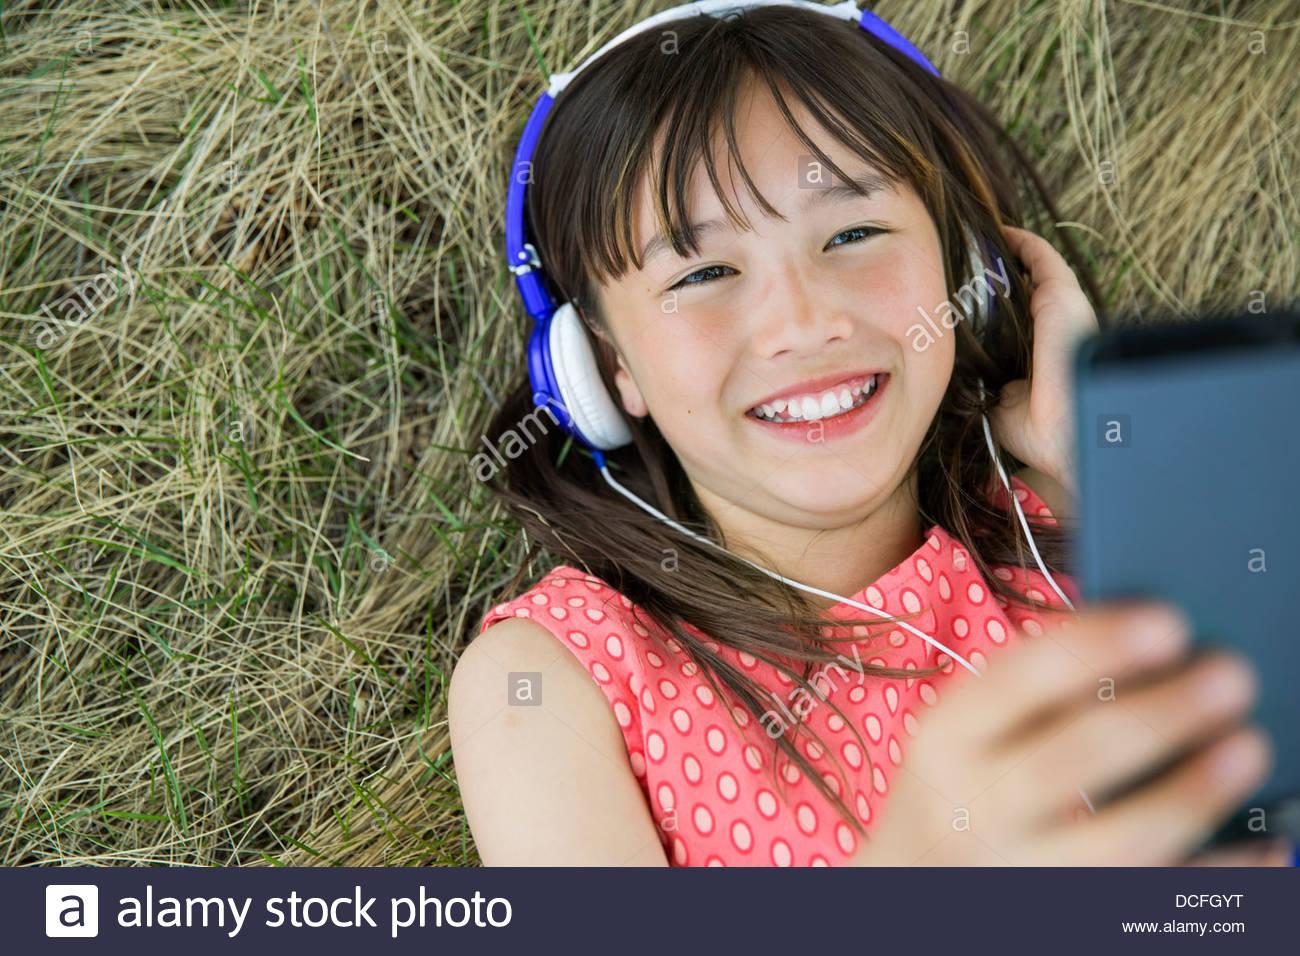 Girl lying down listening to headphones Photo Stock